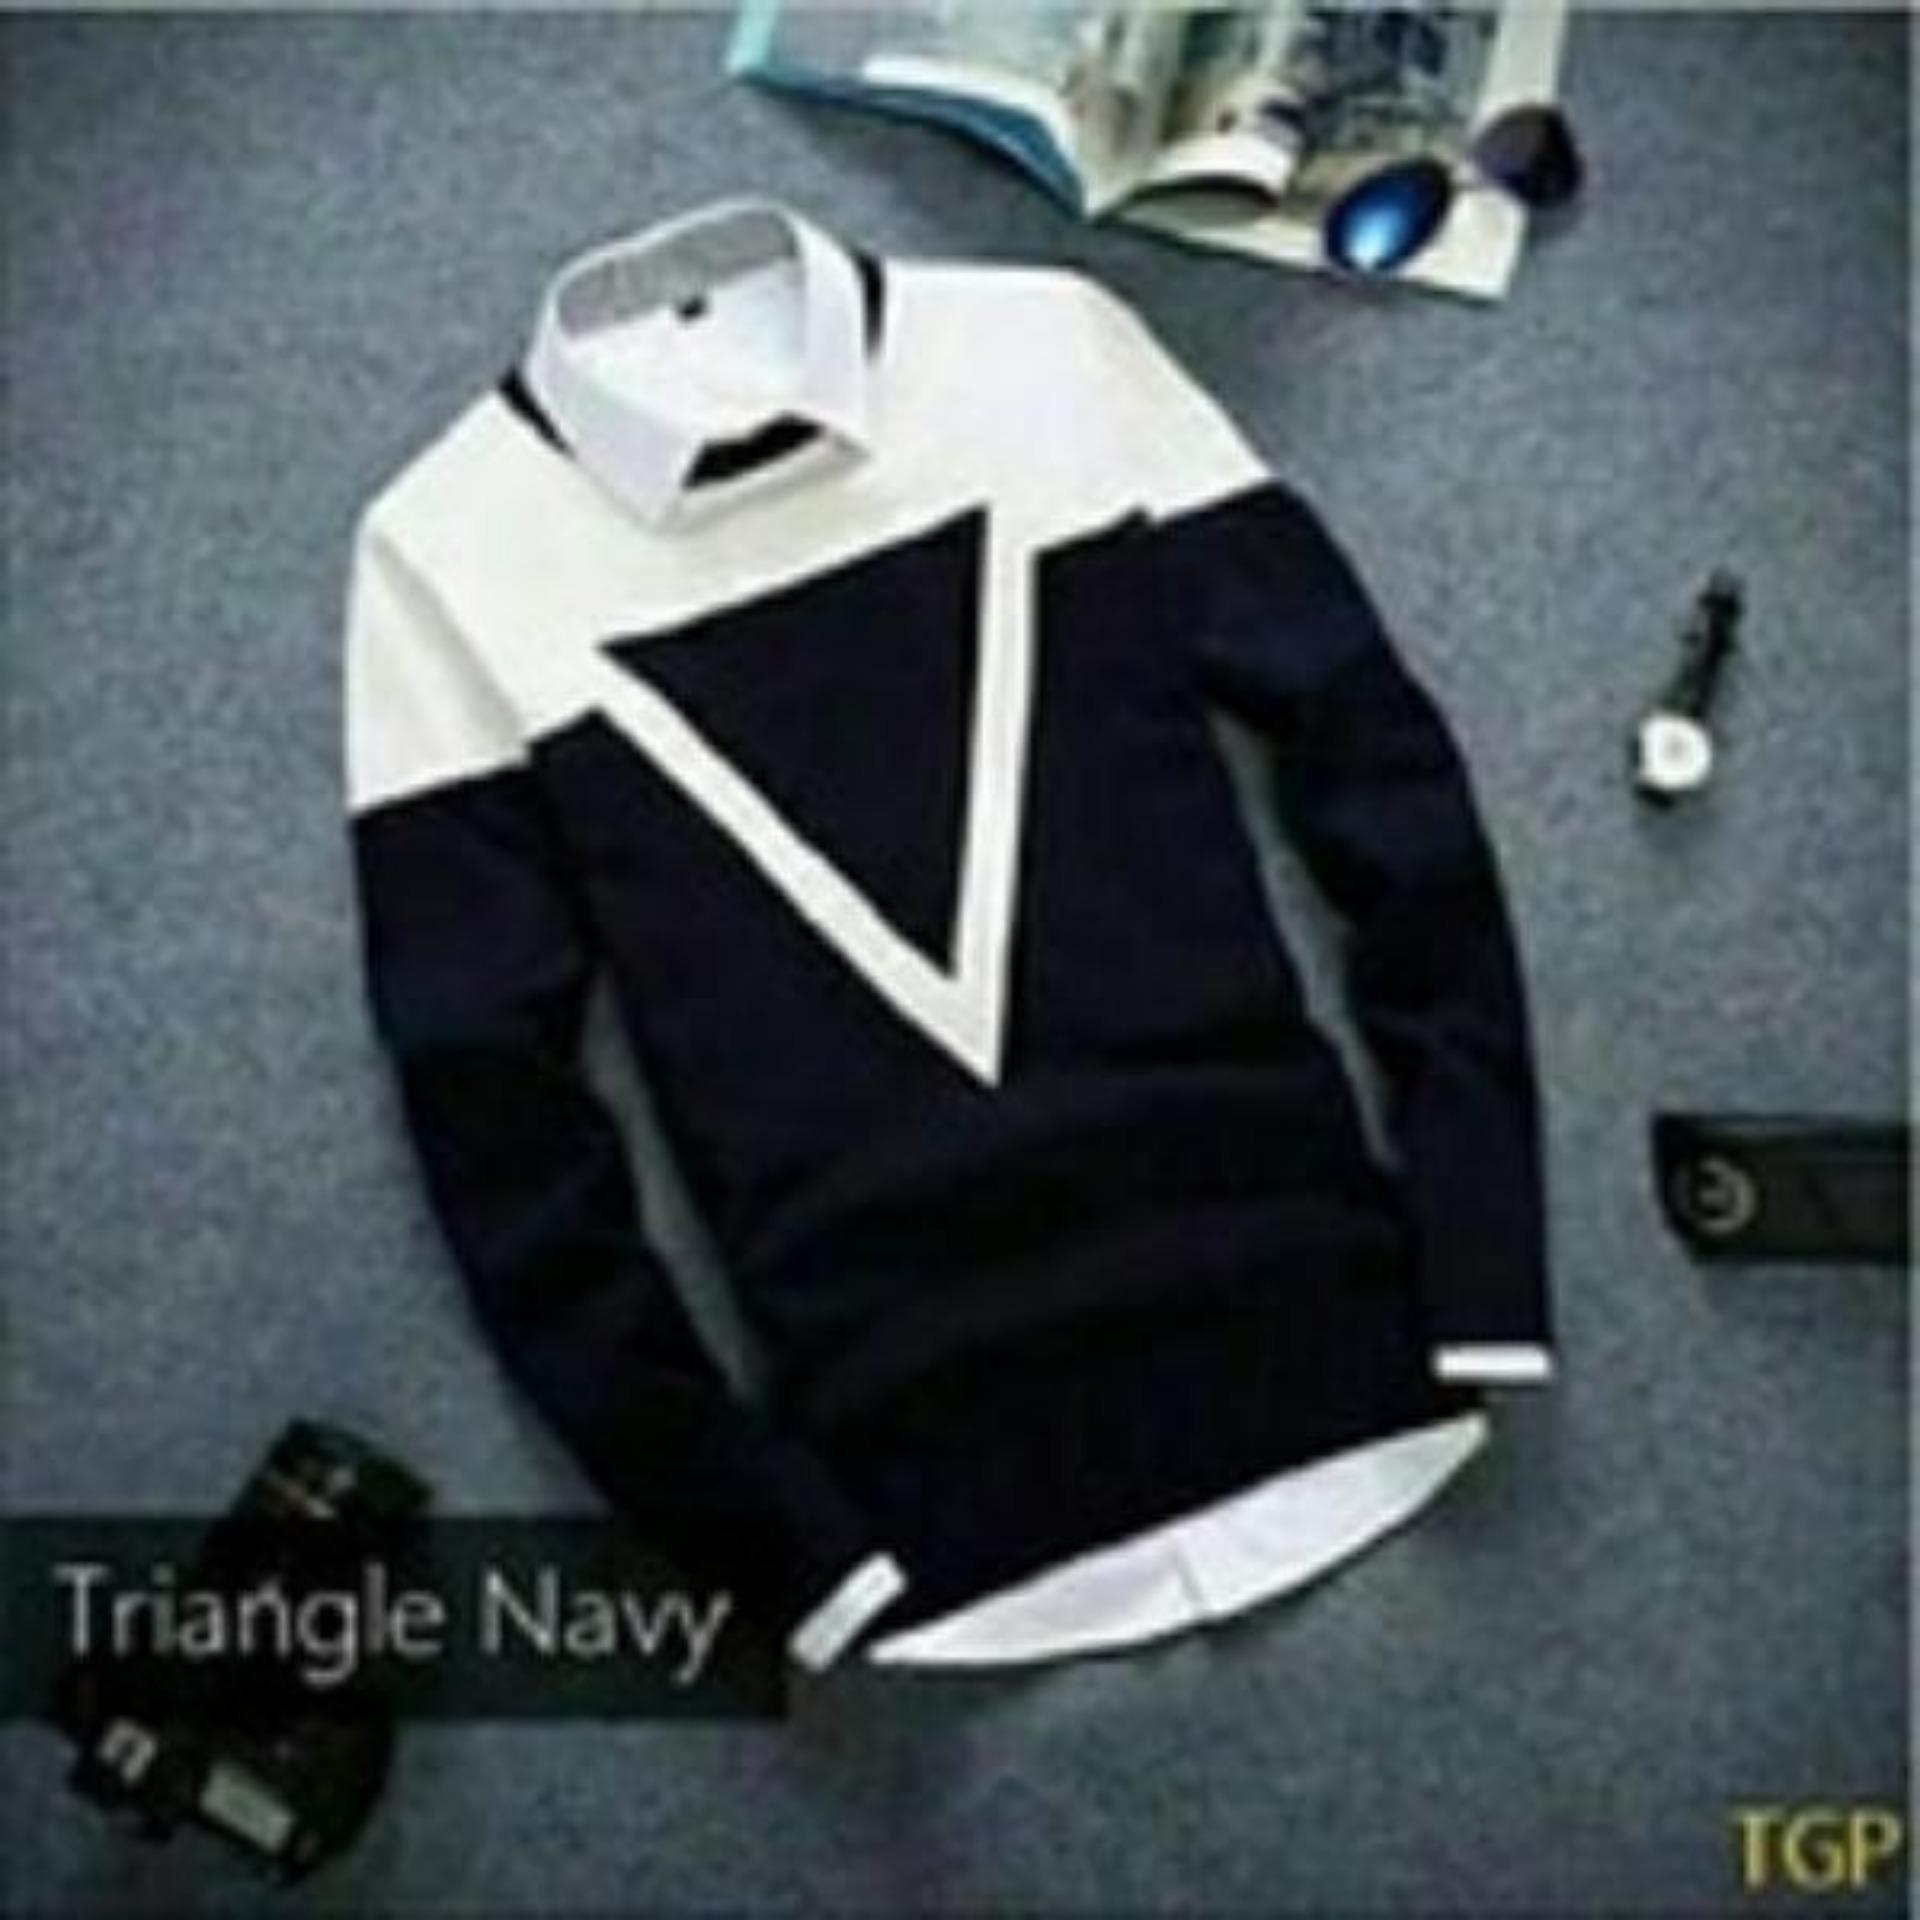 Sweater Pria Lengkap Termodis Switer Rajut Best Seller Azuma Premium Trianggel Navy Tribal